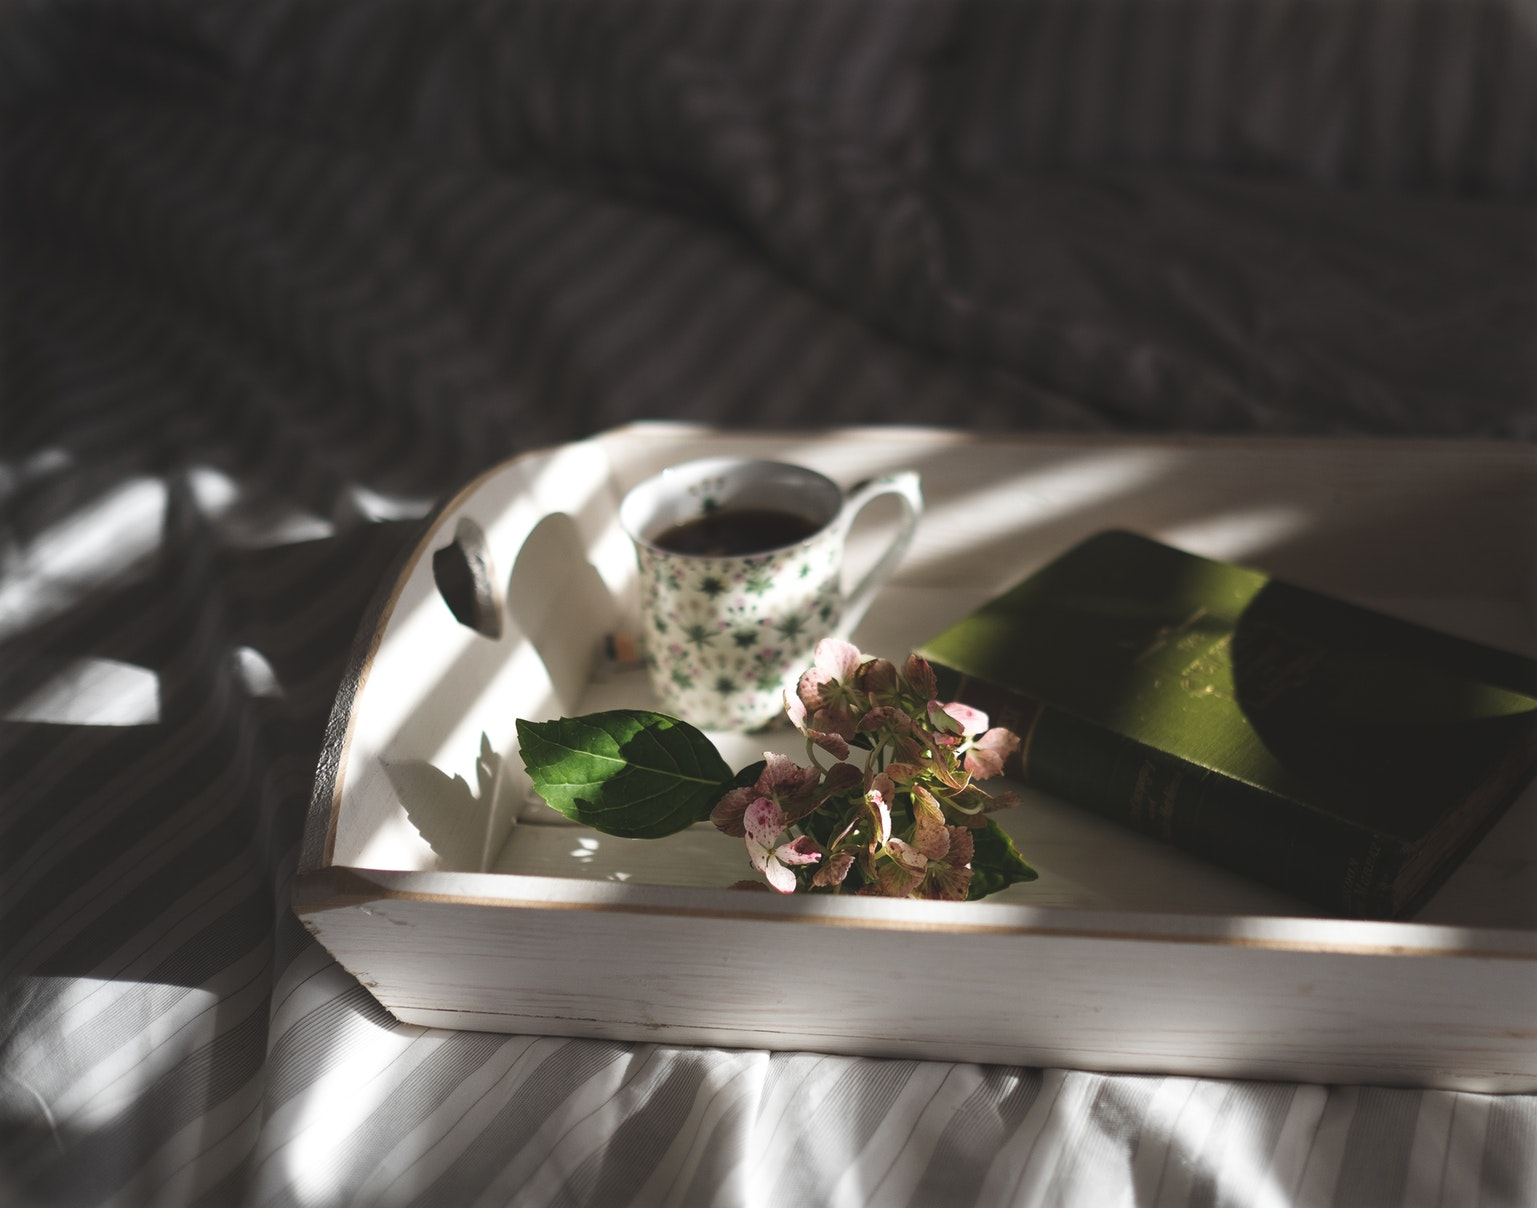 """Tajna kći"" by Kelly Rimmer - Australski domovi ibsenovski feminizam i priča koju treba razvijati ""Tajna kći"" by Kelly Rimmer - Australski domovi ibsenovski feminizam i priča koju treba razvijati"